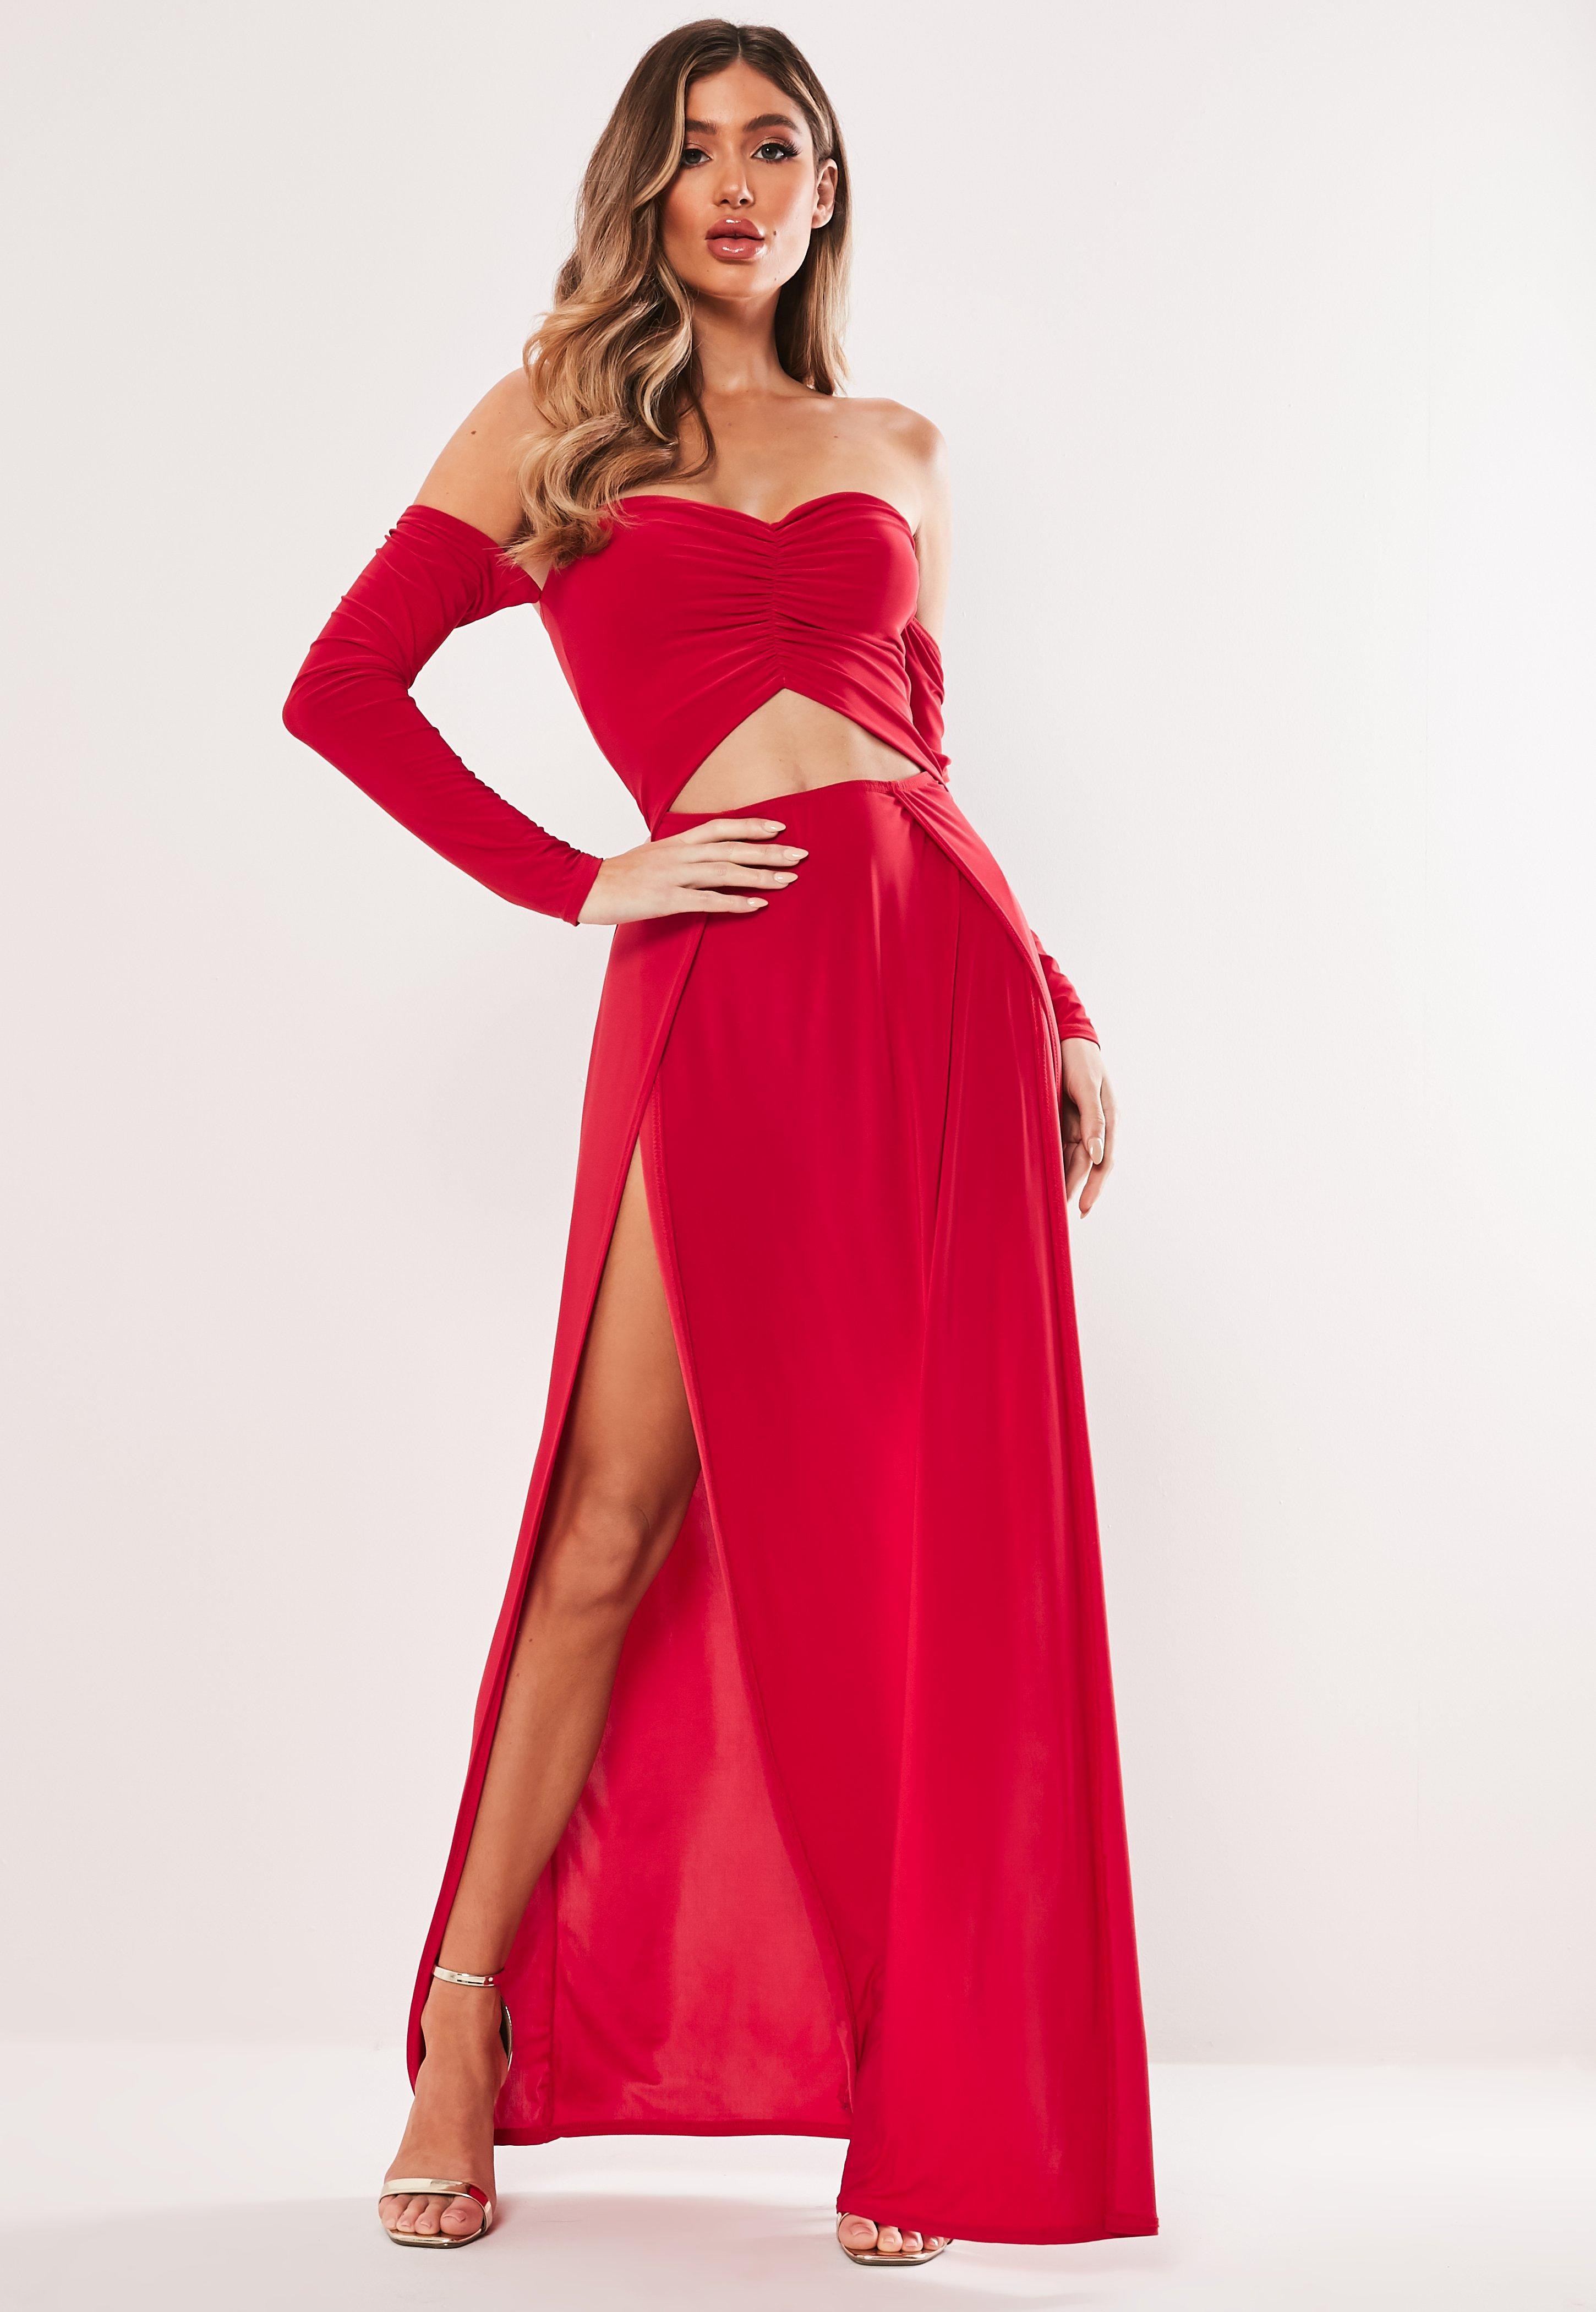 5599559a19f4 Bardot Dresses